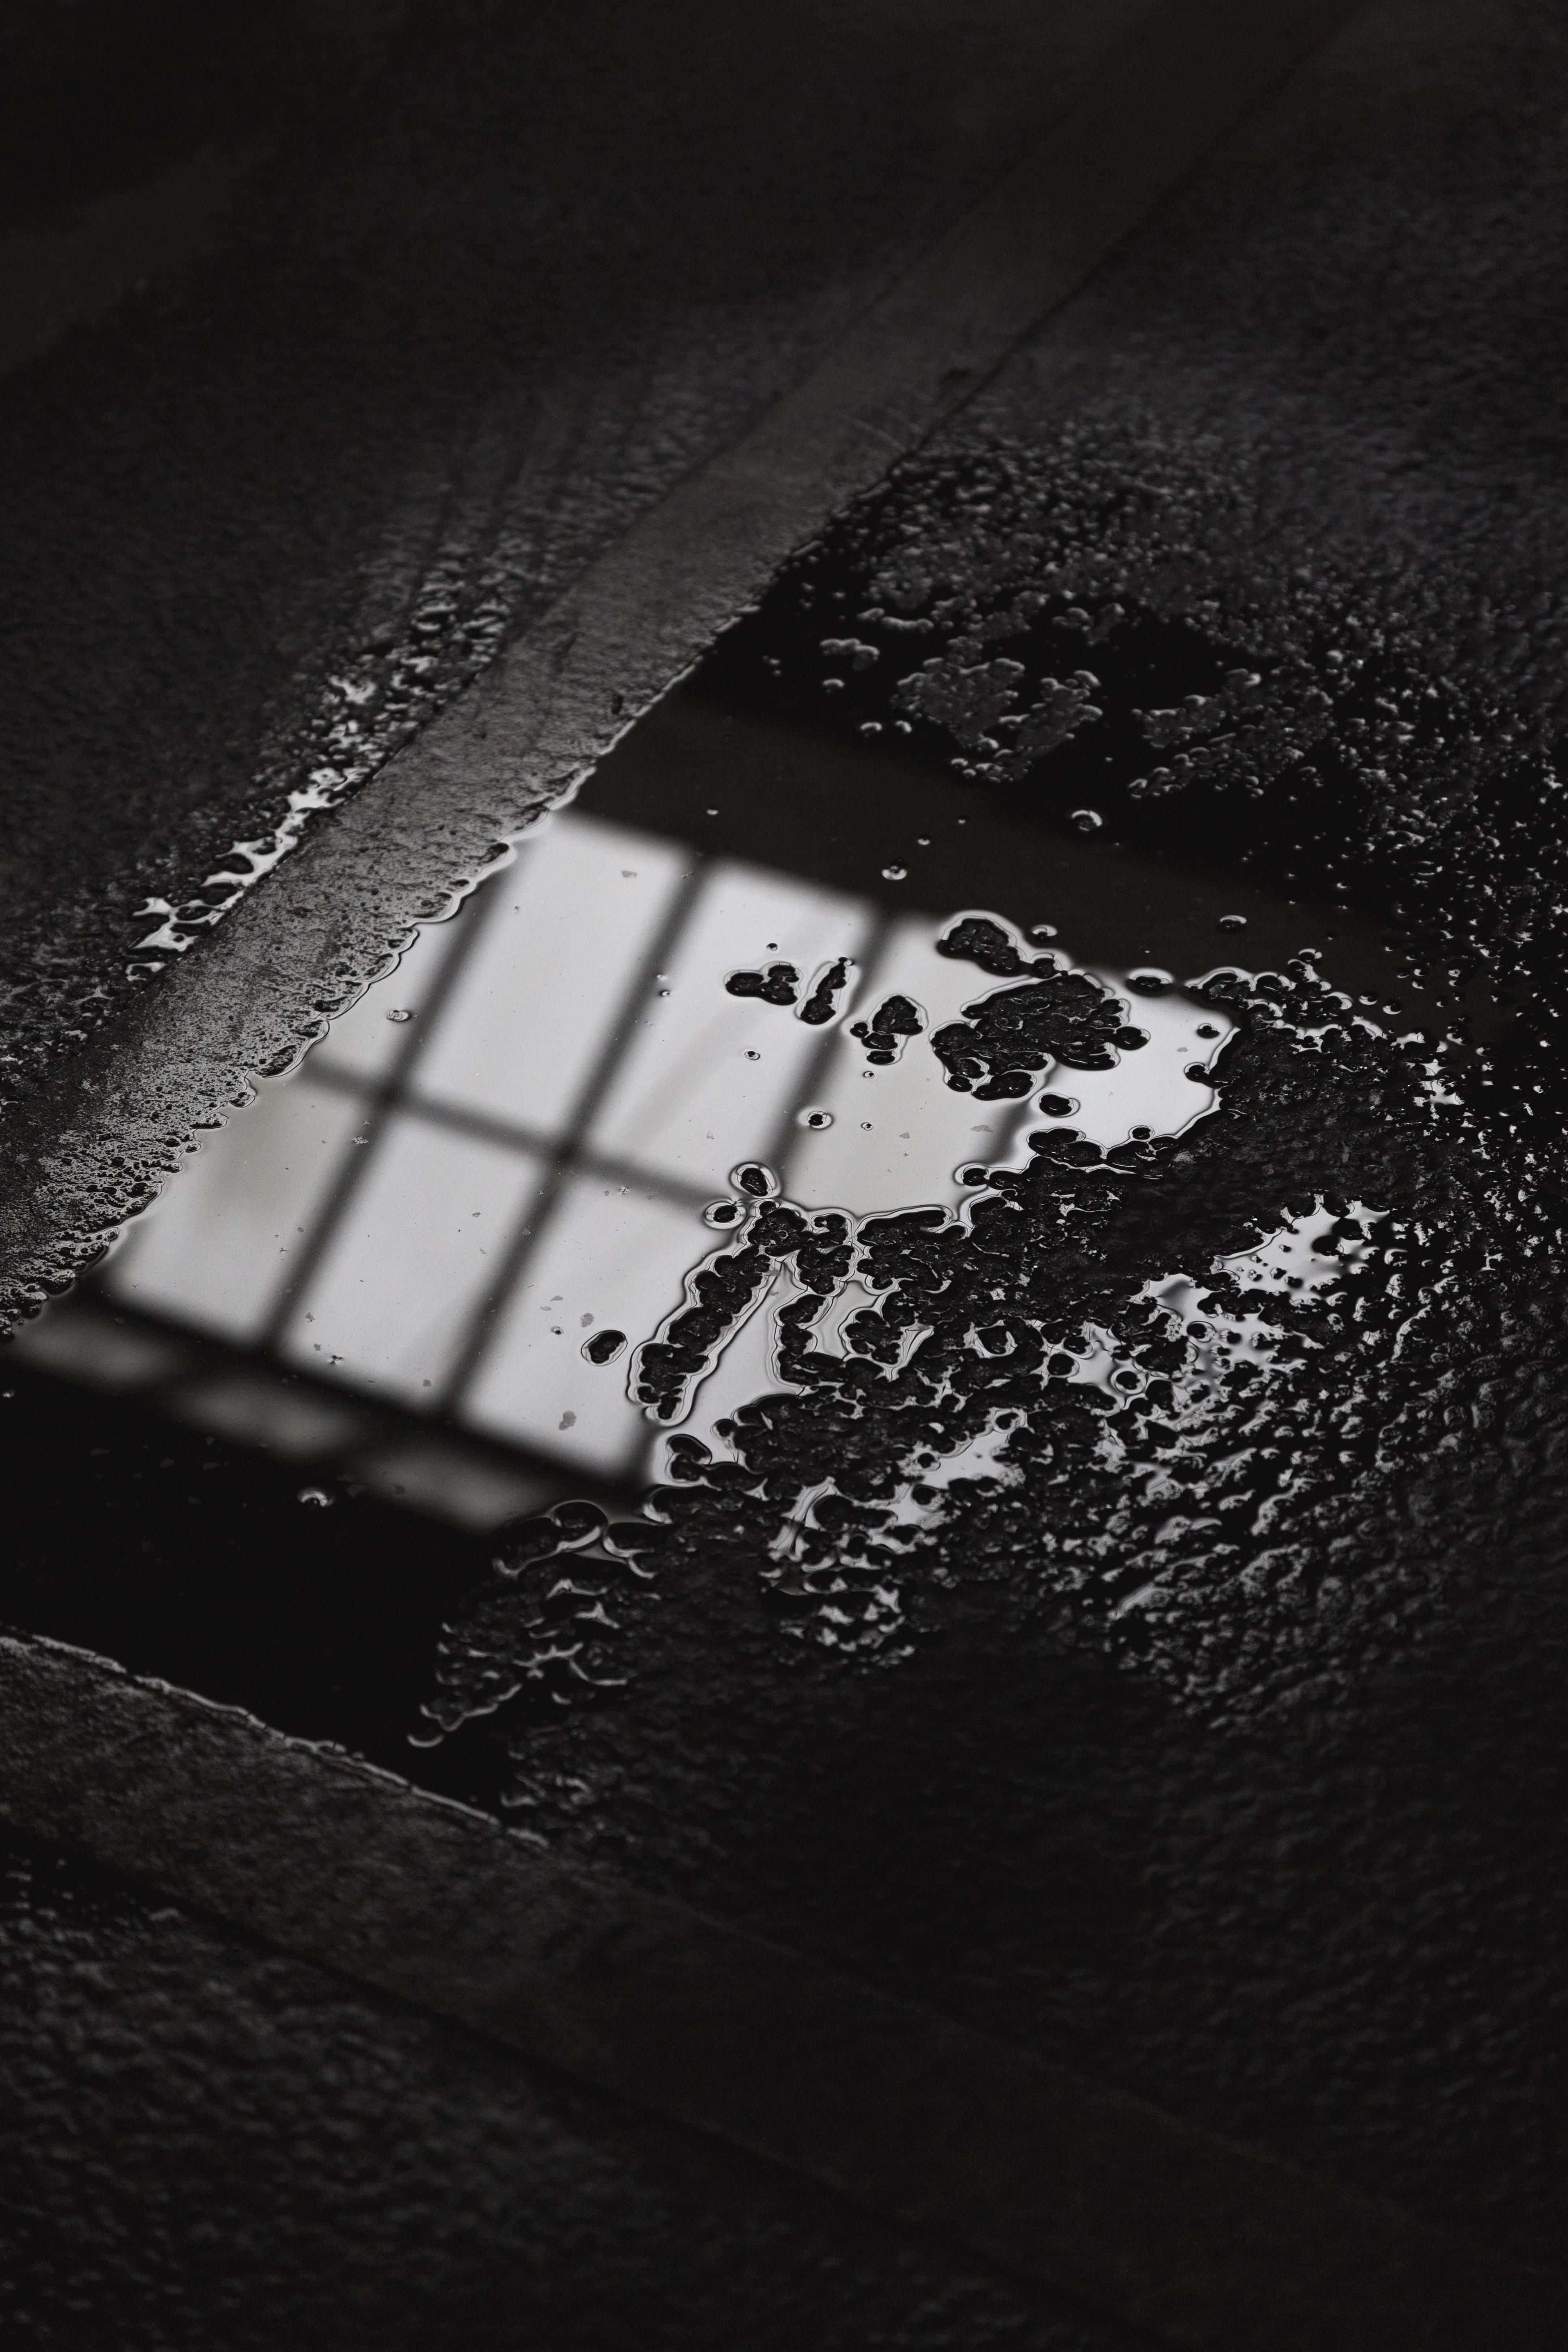 water drops on gray flooring